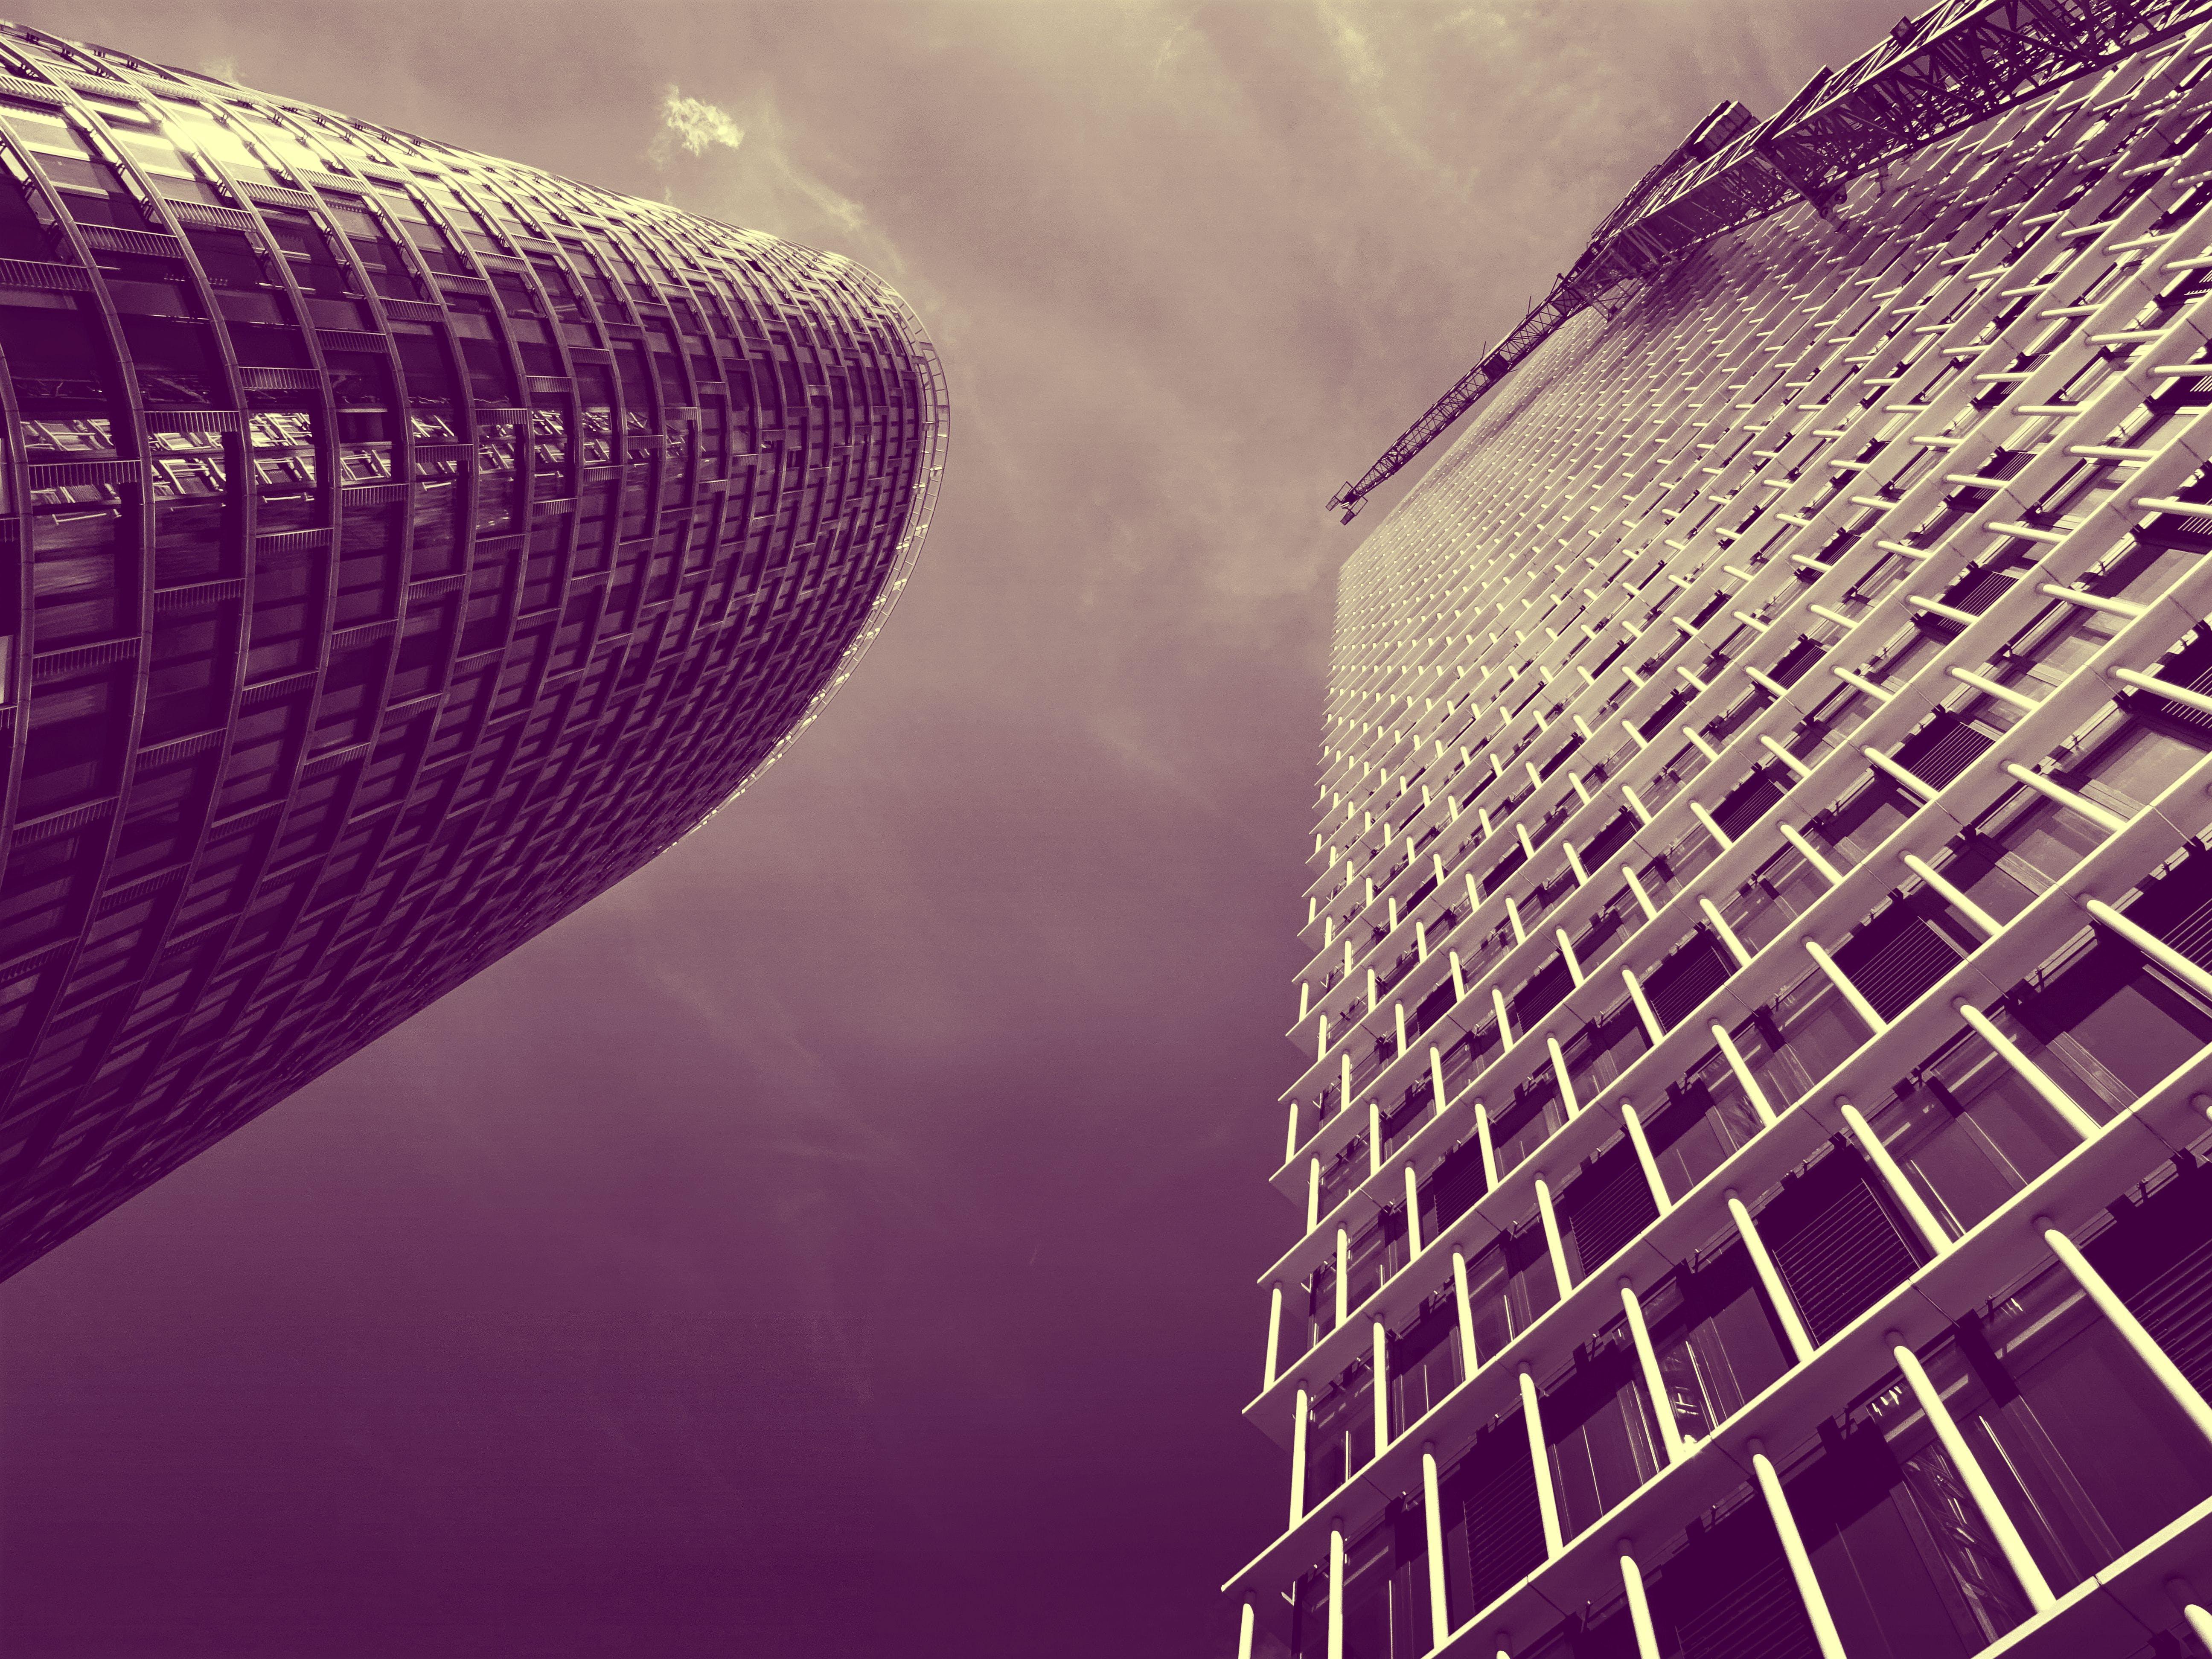 architectural design, buildings, clouds